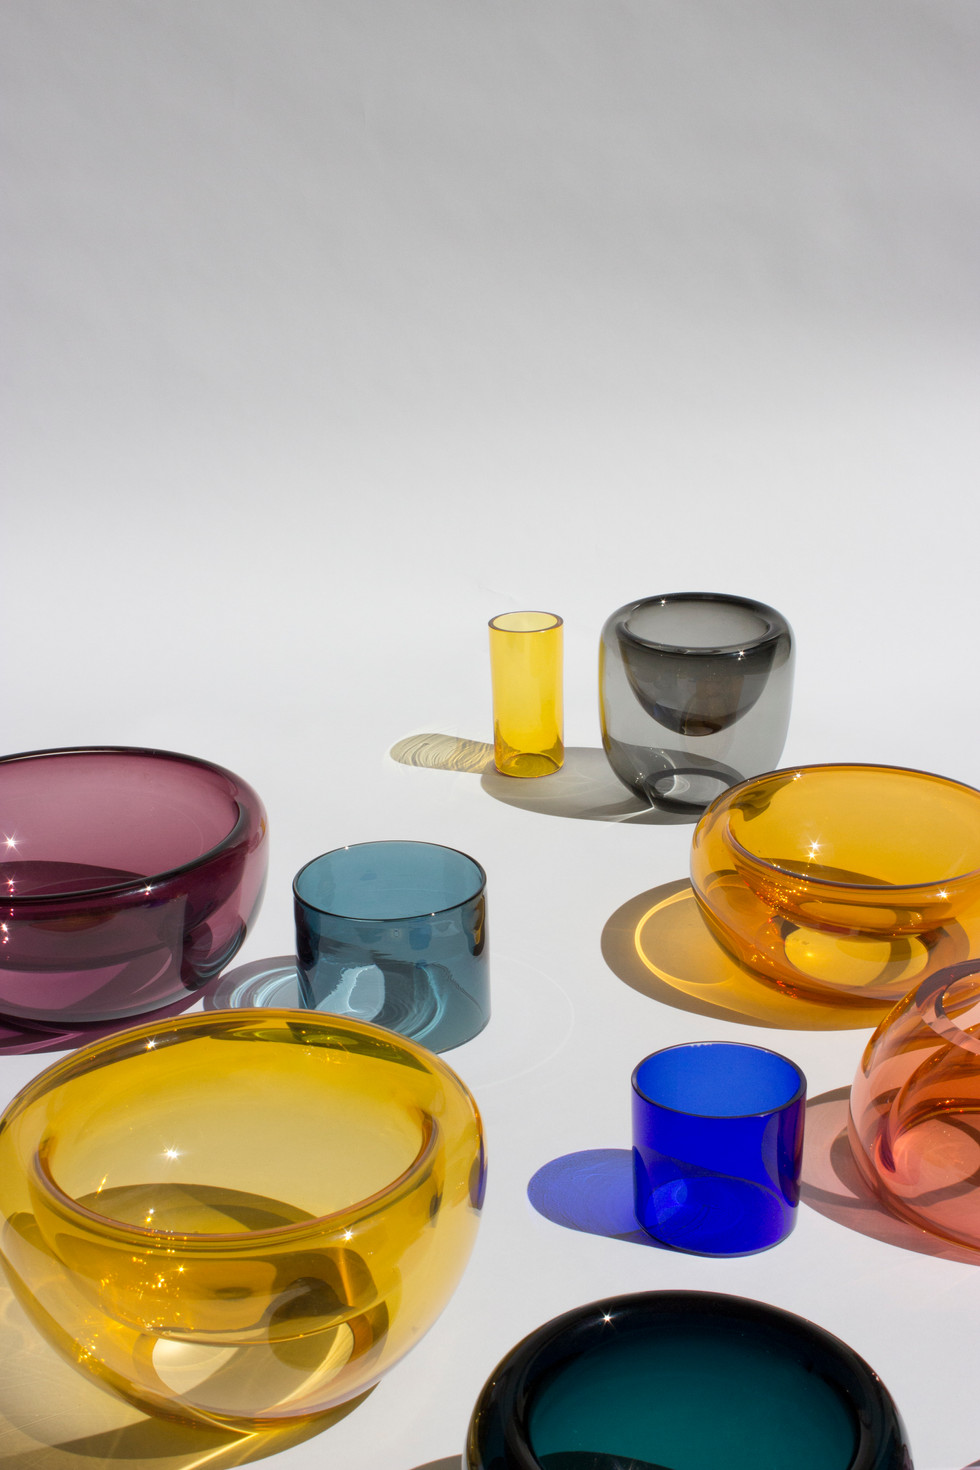 SPHERE GLASS BOWLS  by MILENA KLING for STUDIO HAUSEN